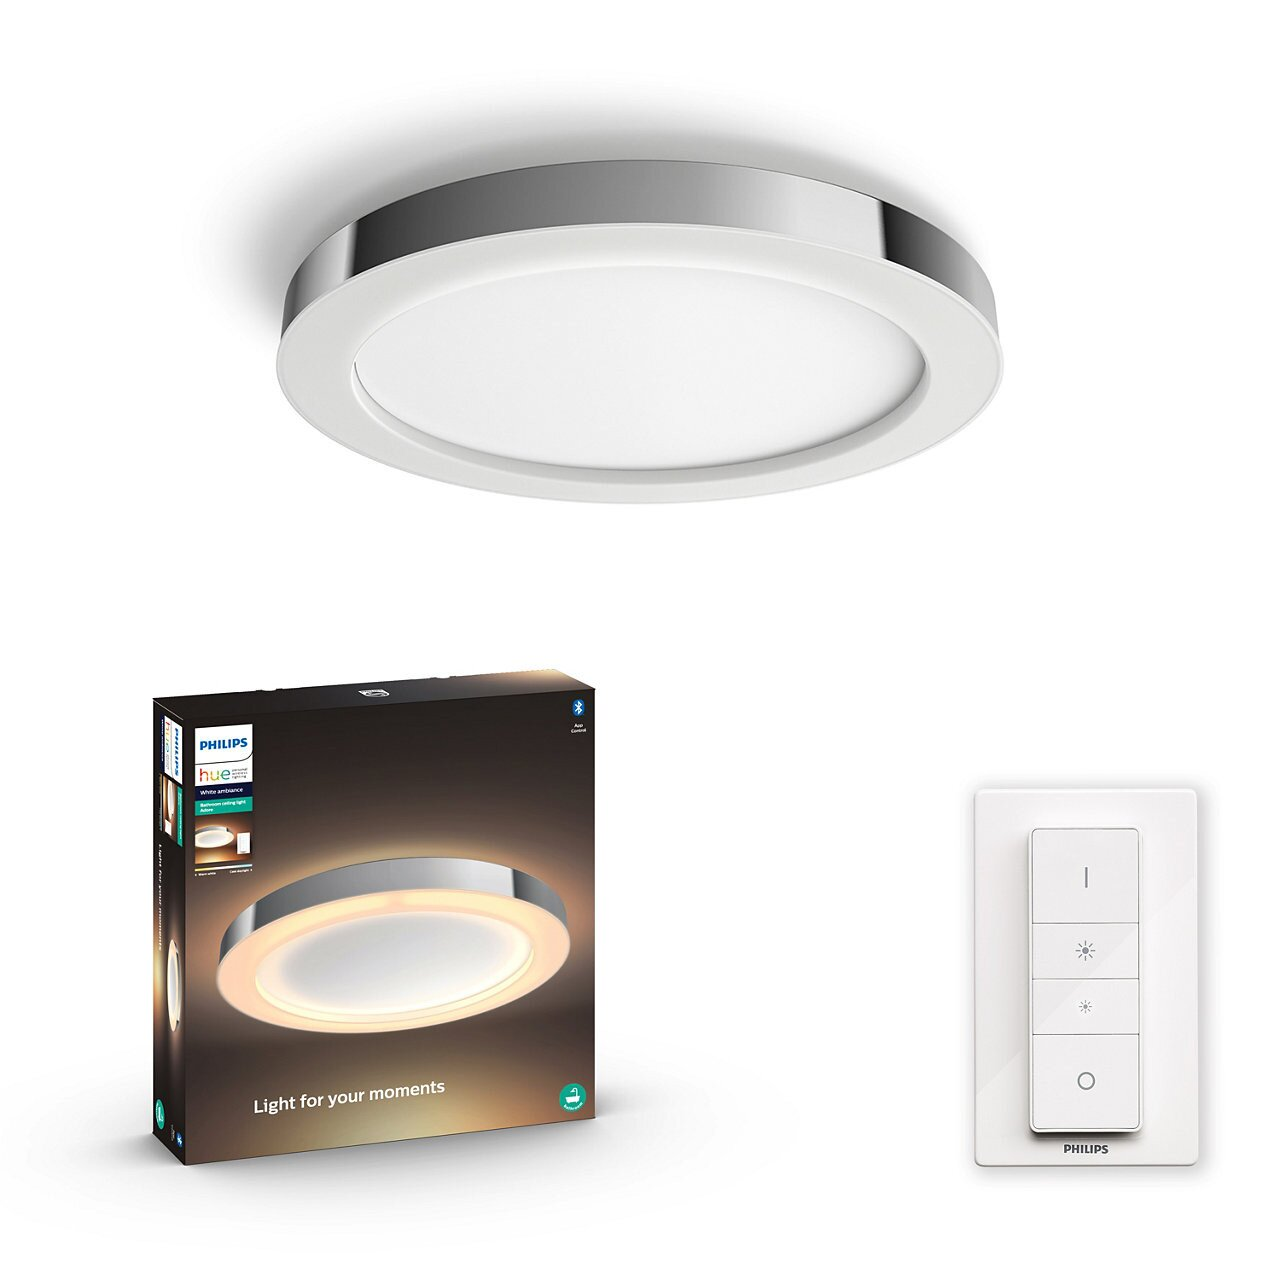 Buy Philips Adore Bathroom Ceiling Light online in ...